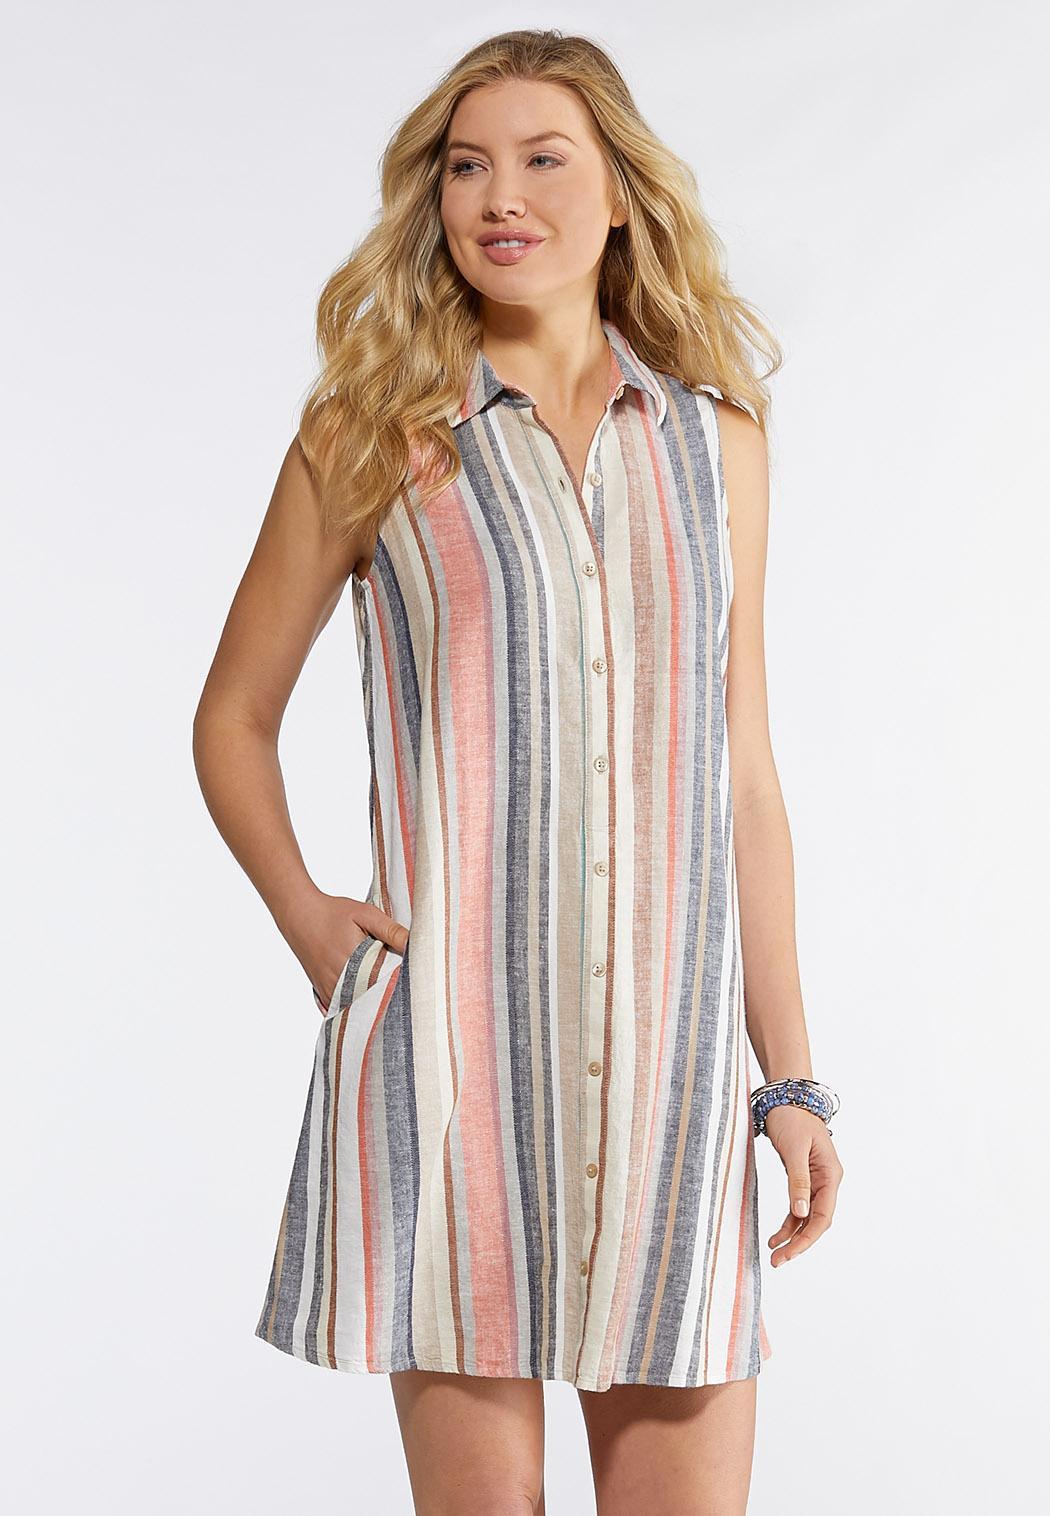 Plus Size Stripe Linen Shirt Dress Shirt Dress Cato Fashions